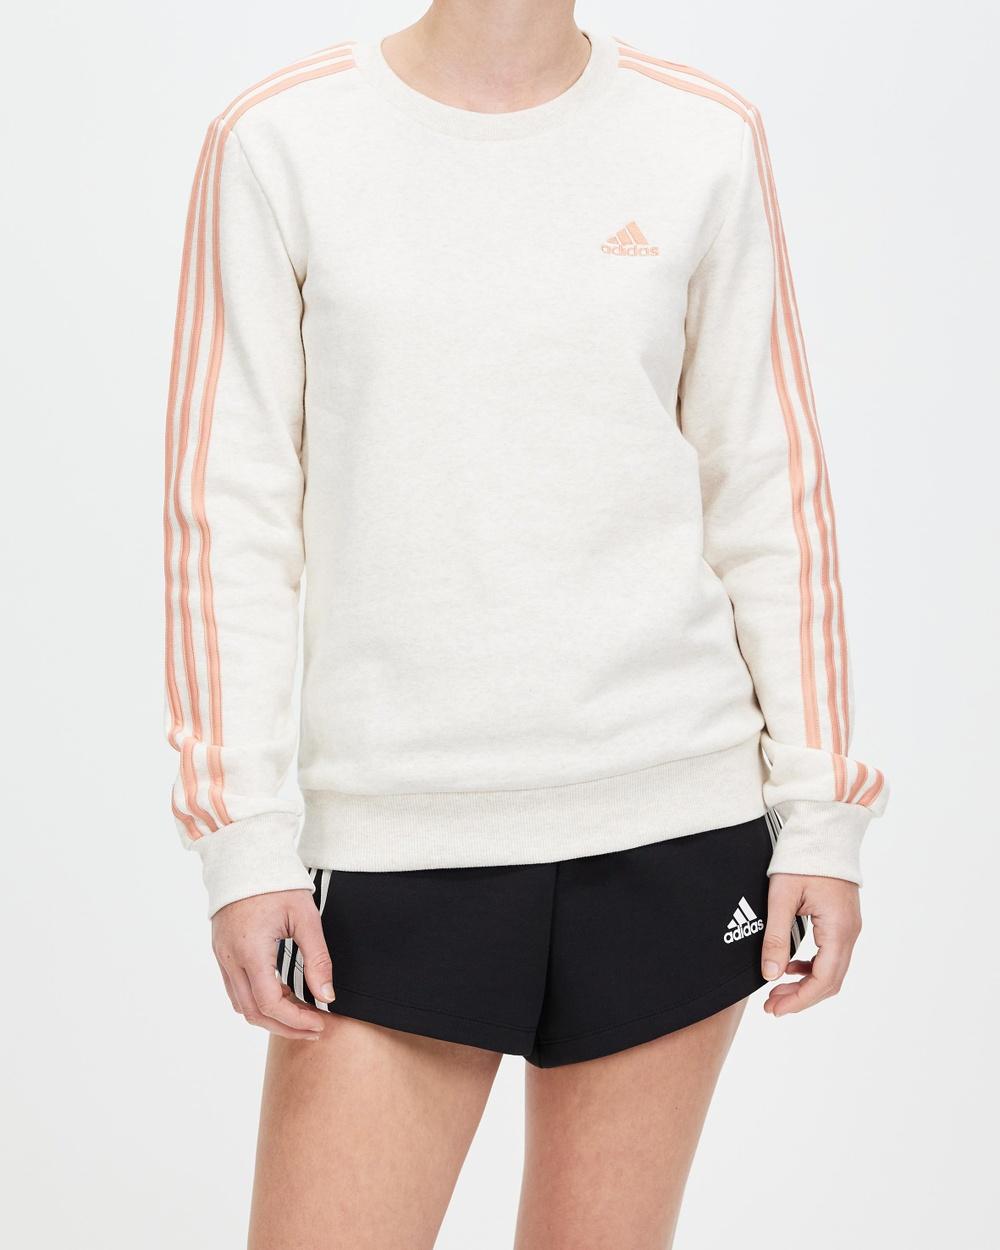 adidas Performance Essentials 3 Stripes Fleece Sweatshirt Crew Necks Off White & Ambient Blush 3-Stripes